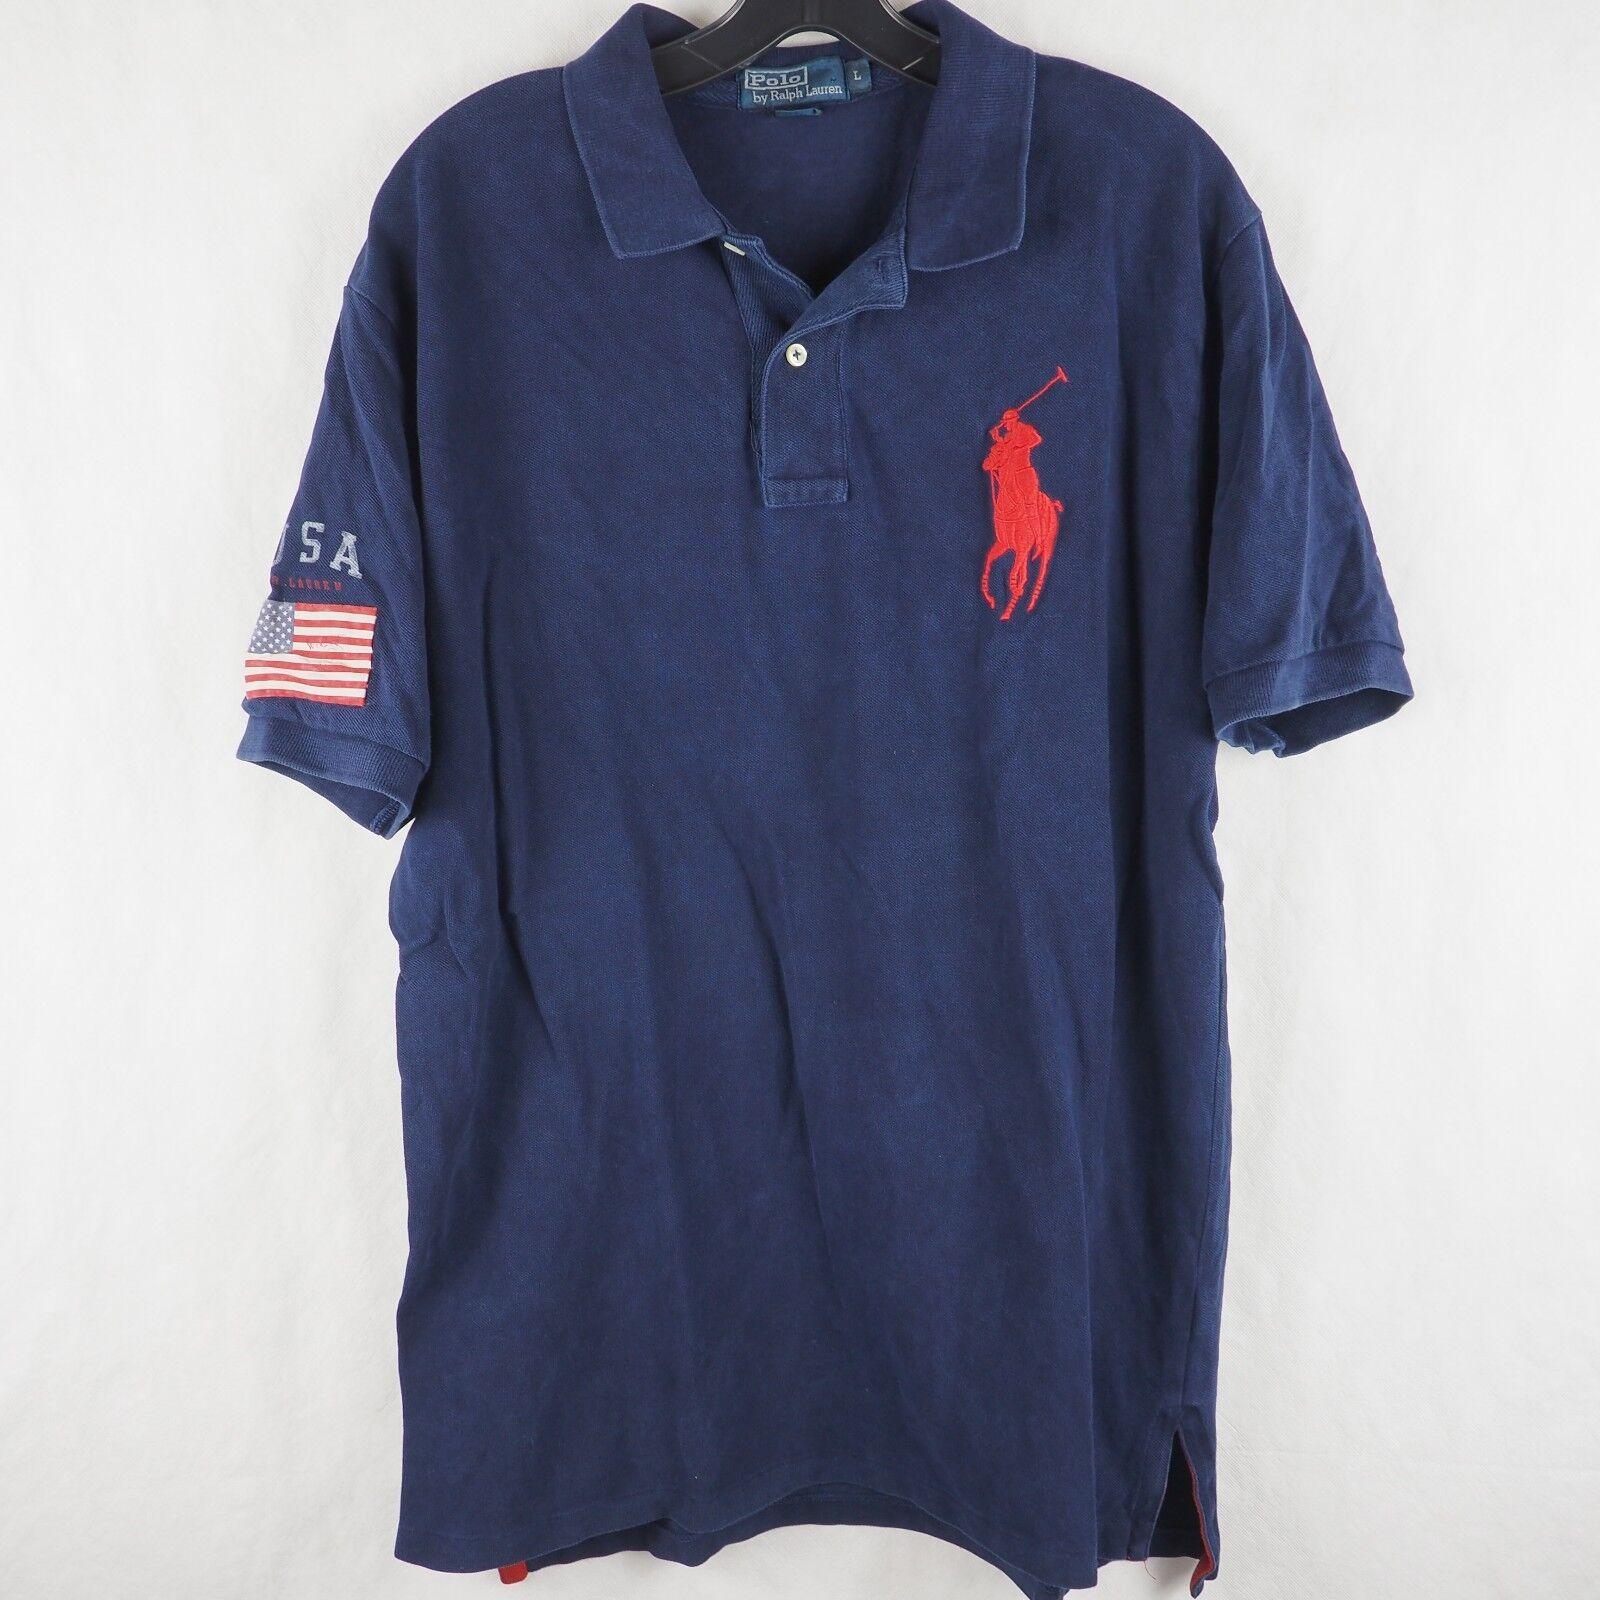 b431b628f Polo Ralph Lauren Men s Polo Shirt Big Logo USA Flag Patch Rugby Cotton  bluee L